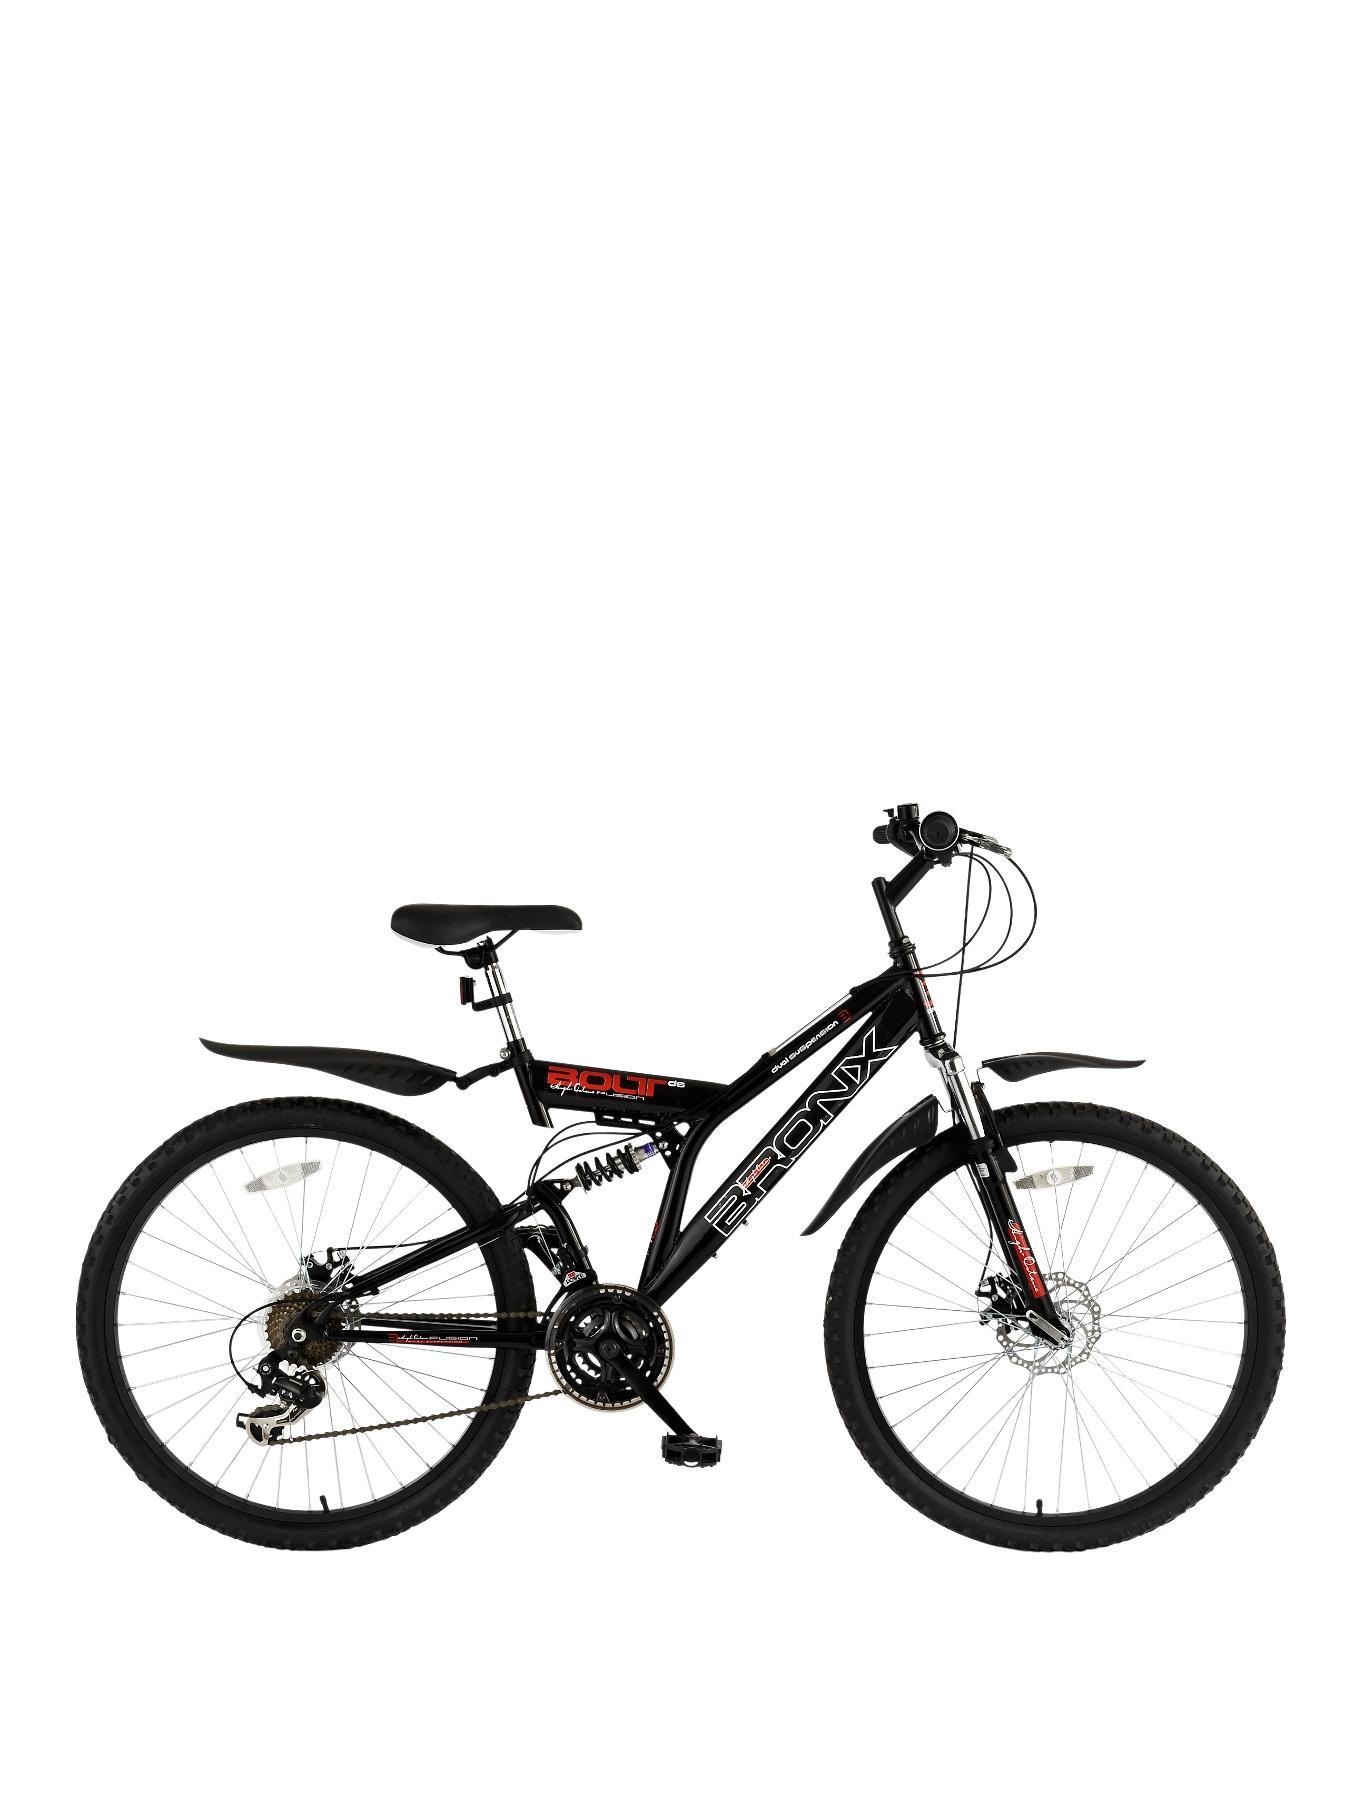 Bolt 18 inch Frame Dual Suspension Mens Mountain Bike